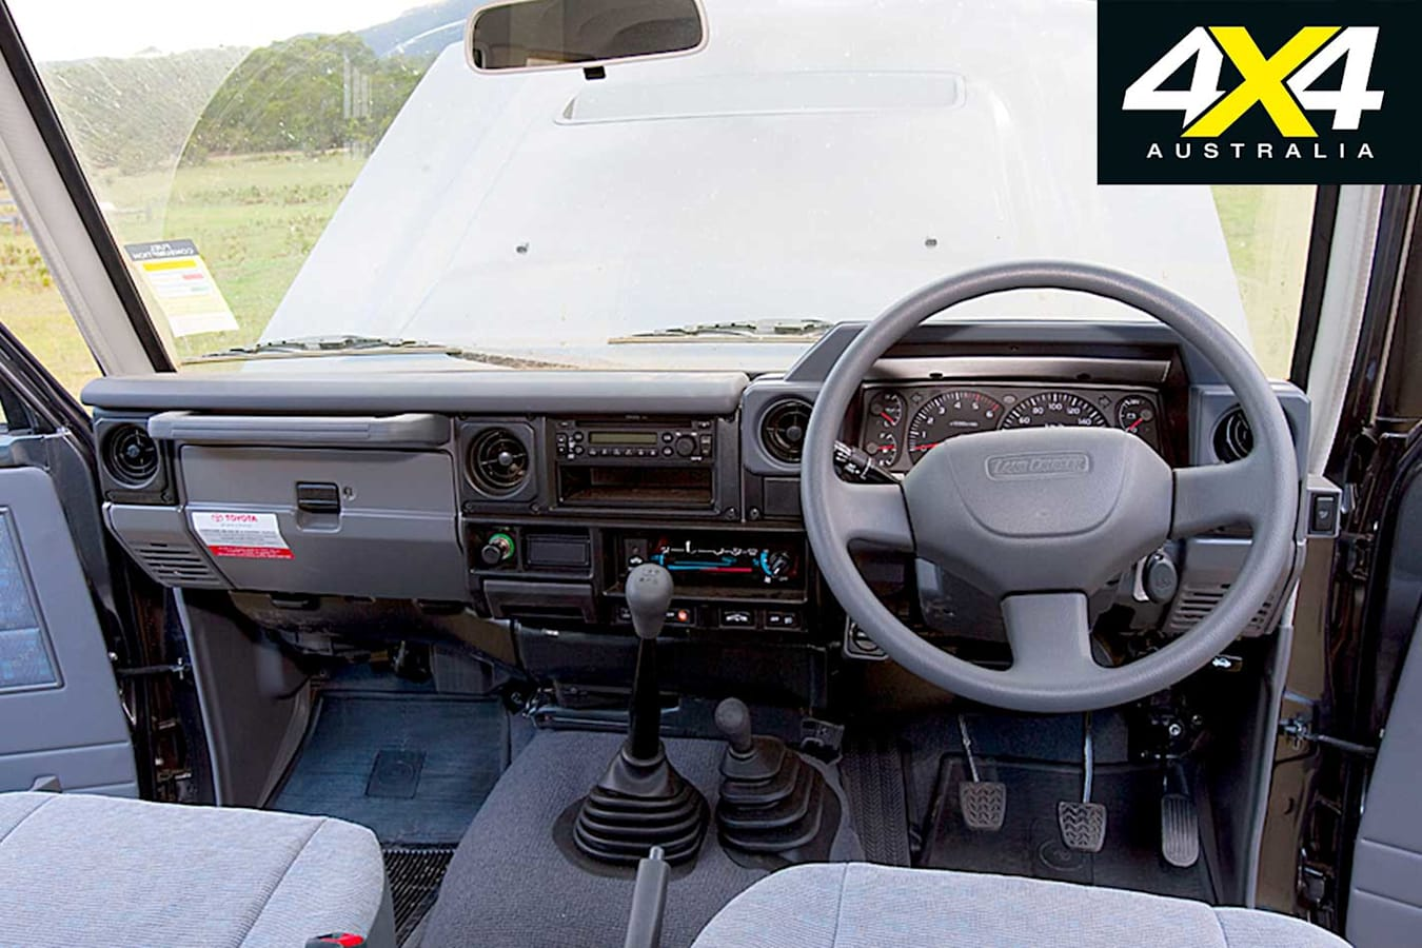 2009 Toyota Land Cruiser 76 Series Interior Jpg